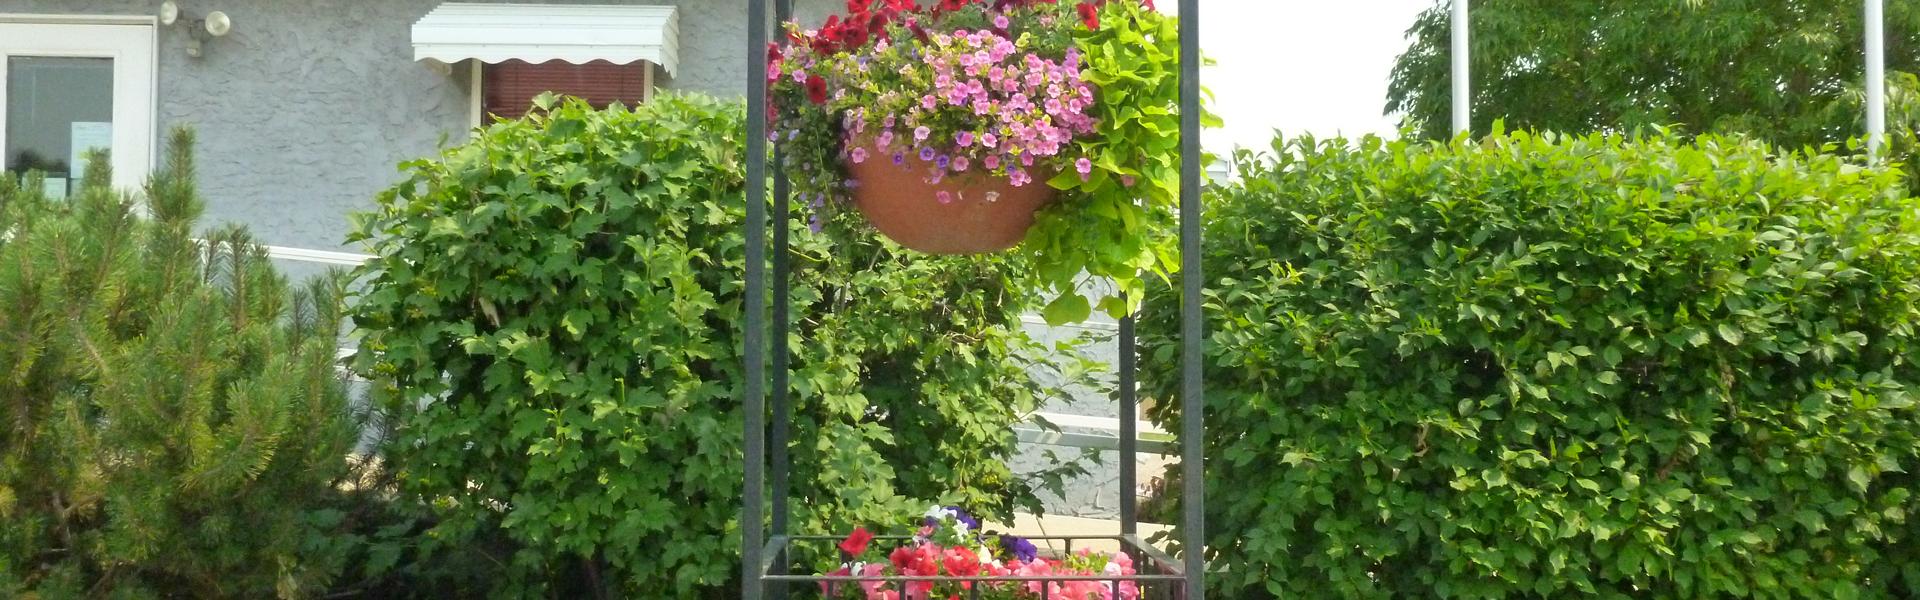 Plants-Slide